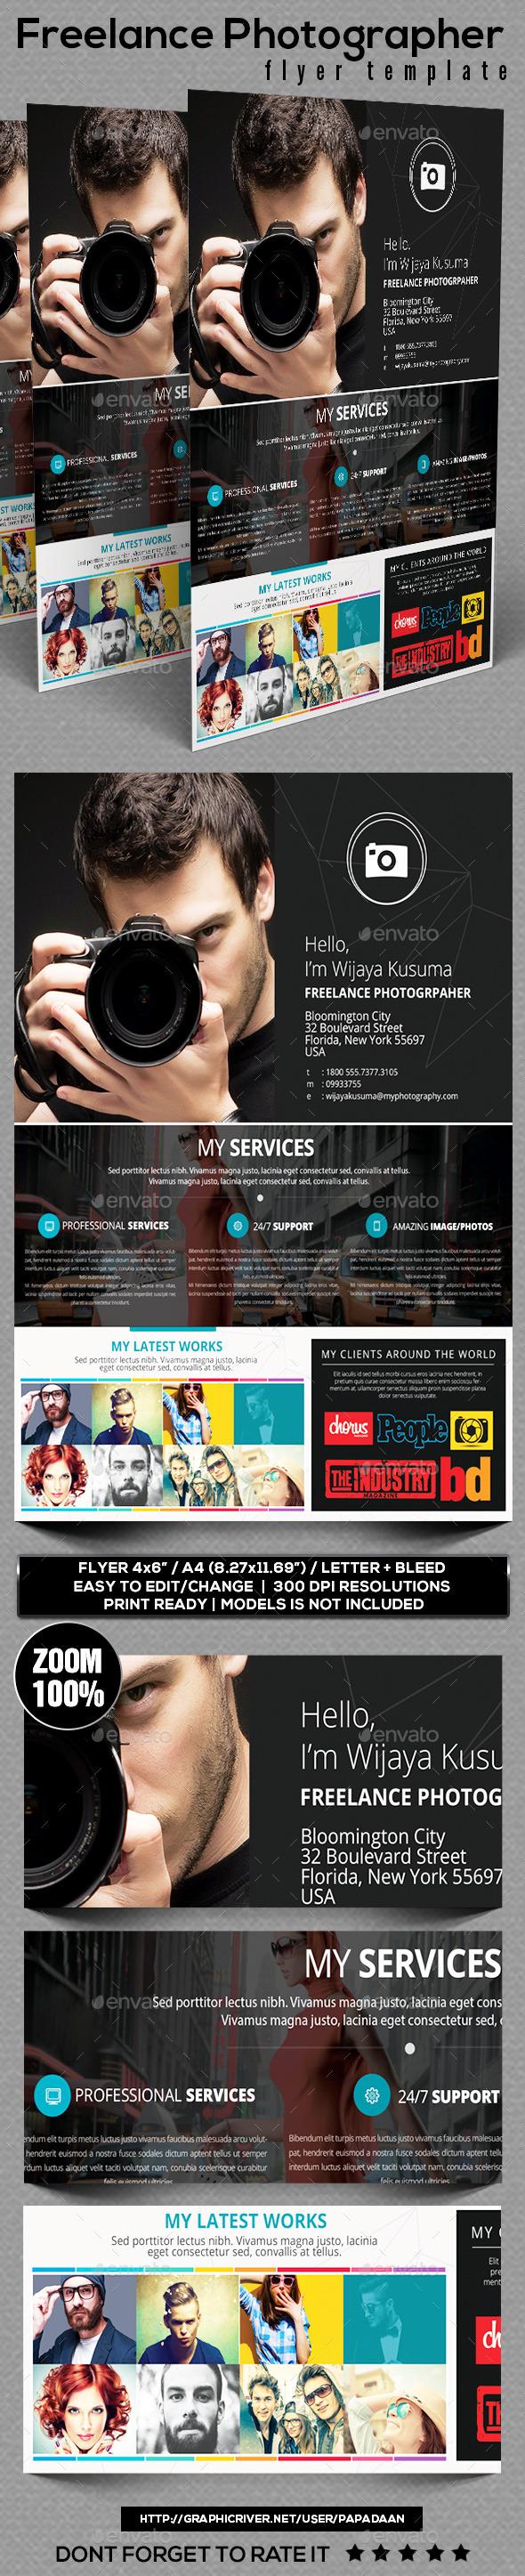 lance photographer flyer template cs3 8 5x11 ad advert lance photographer flyer template cs3 8 5x11 ad advert advertisement